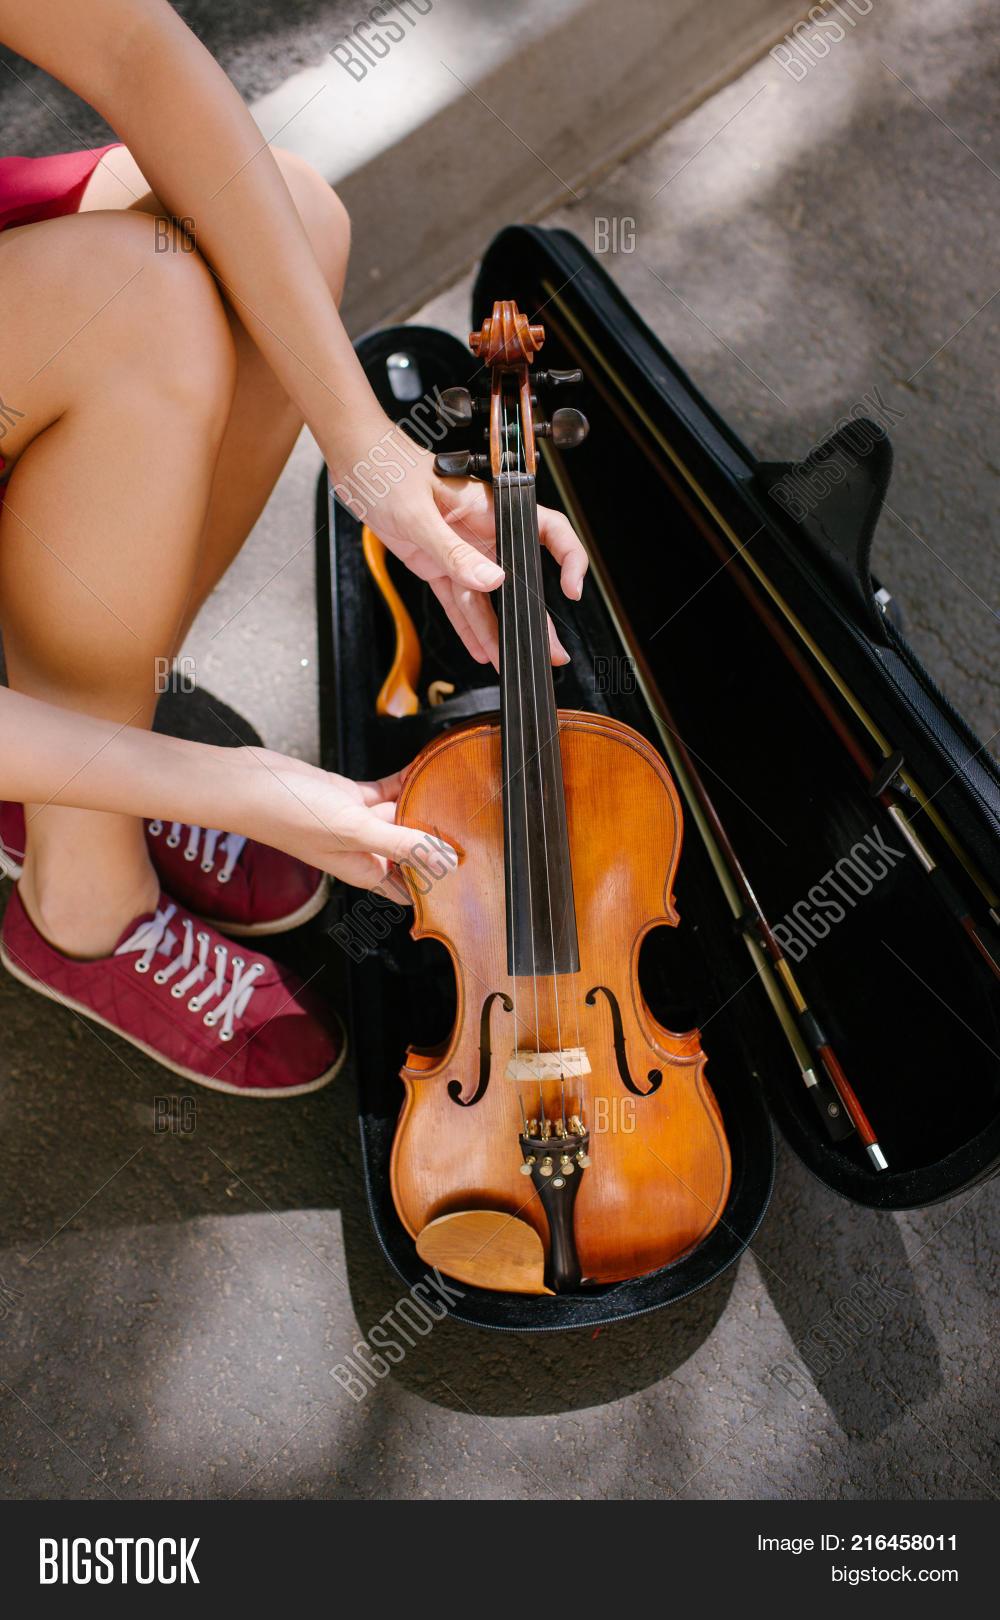 Hot women instruments — pic 9